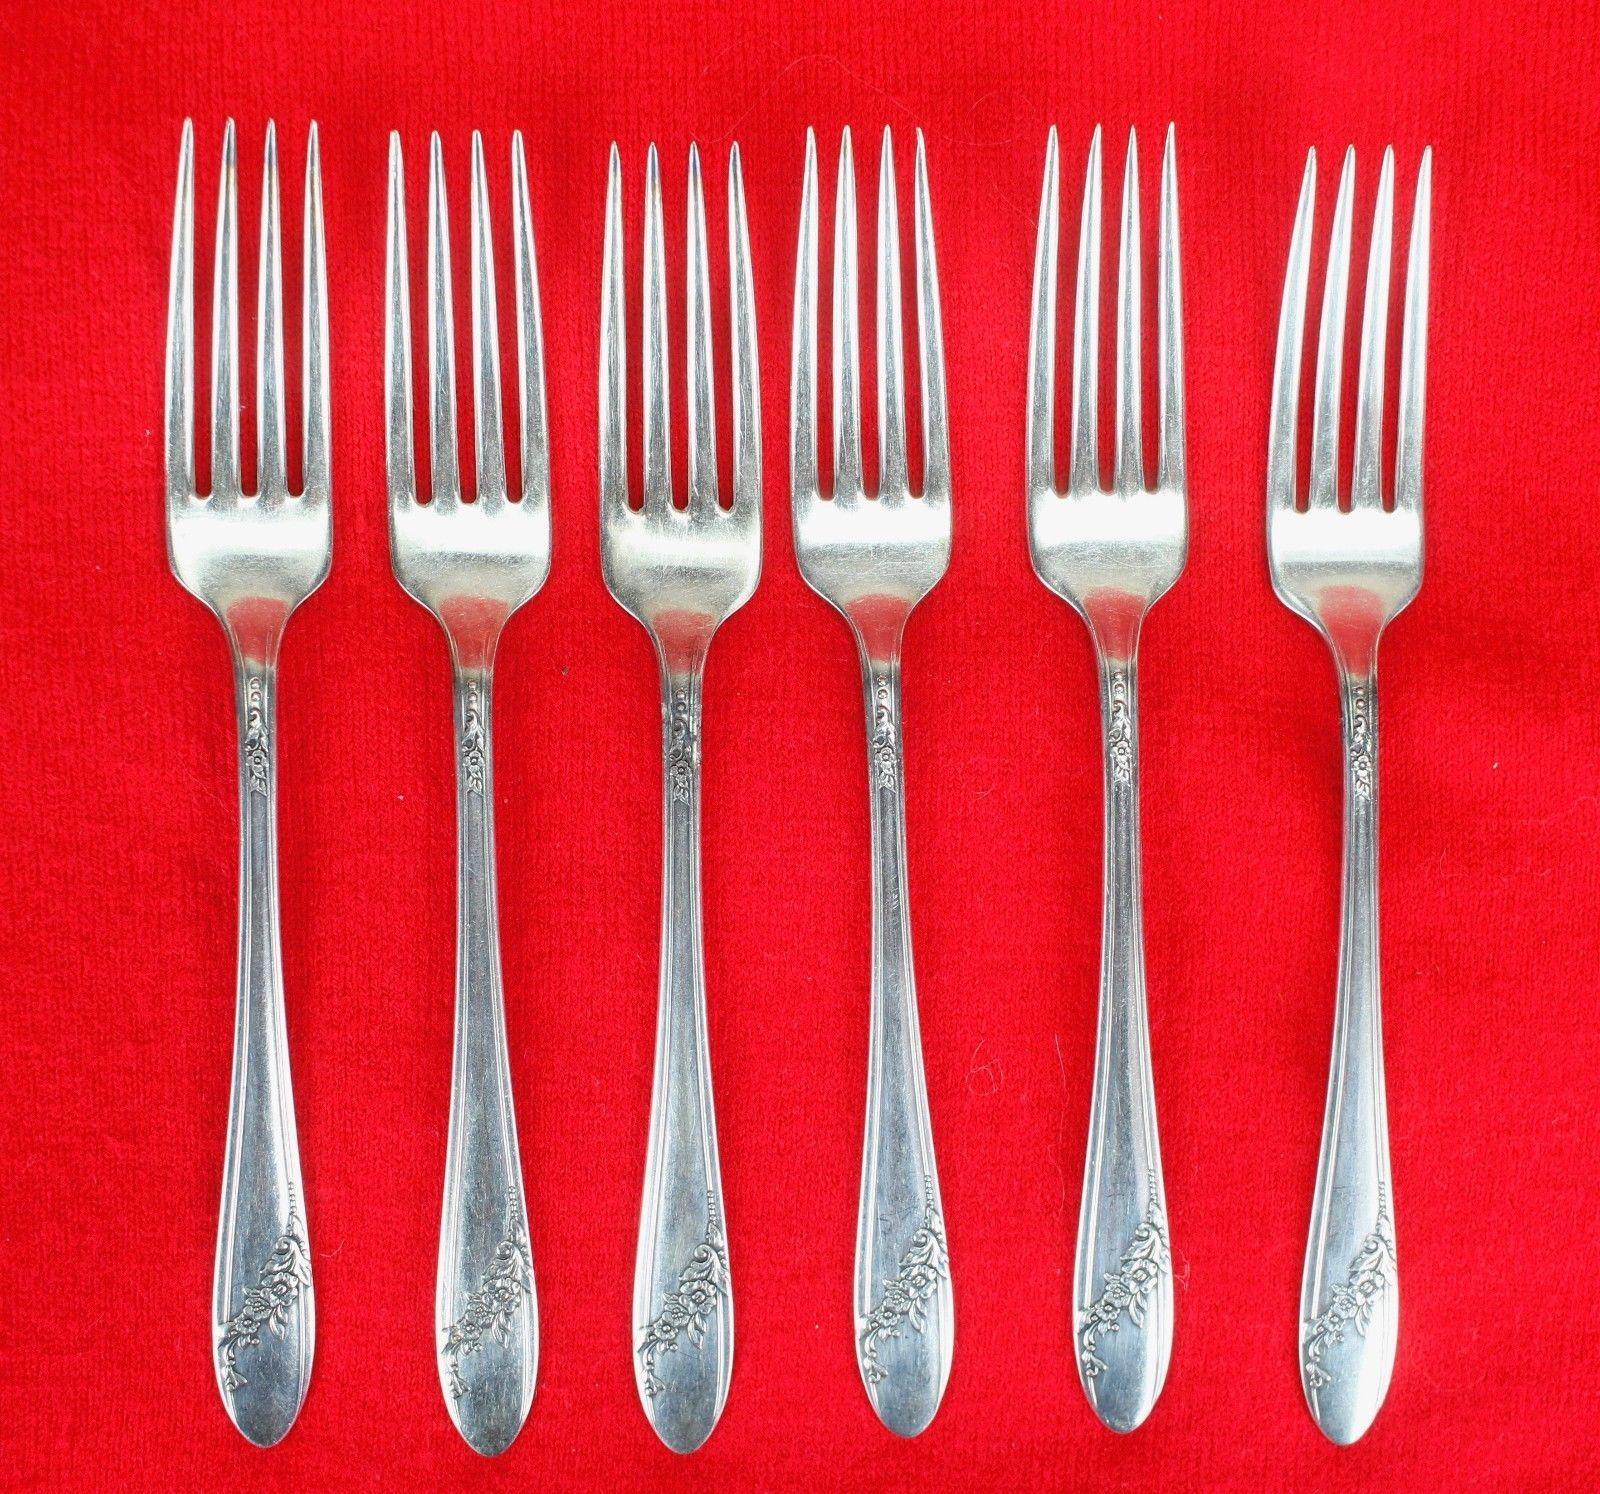 "6X Dinner Forks Oneida Queen Bess II Silverplate 1946 Tudor Flatware 7 1/2"" Fork"